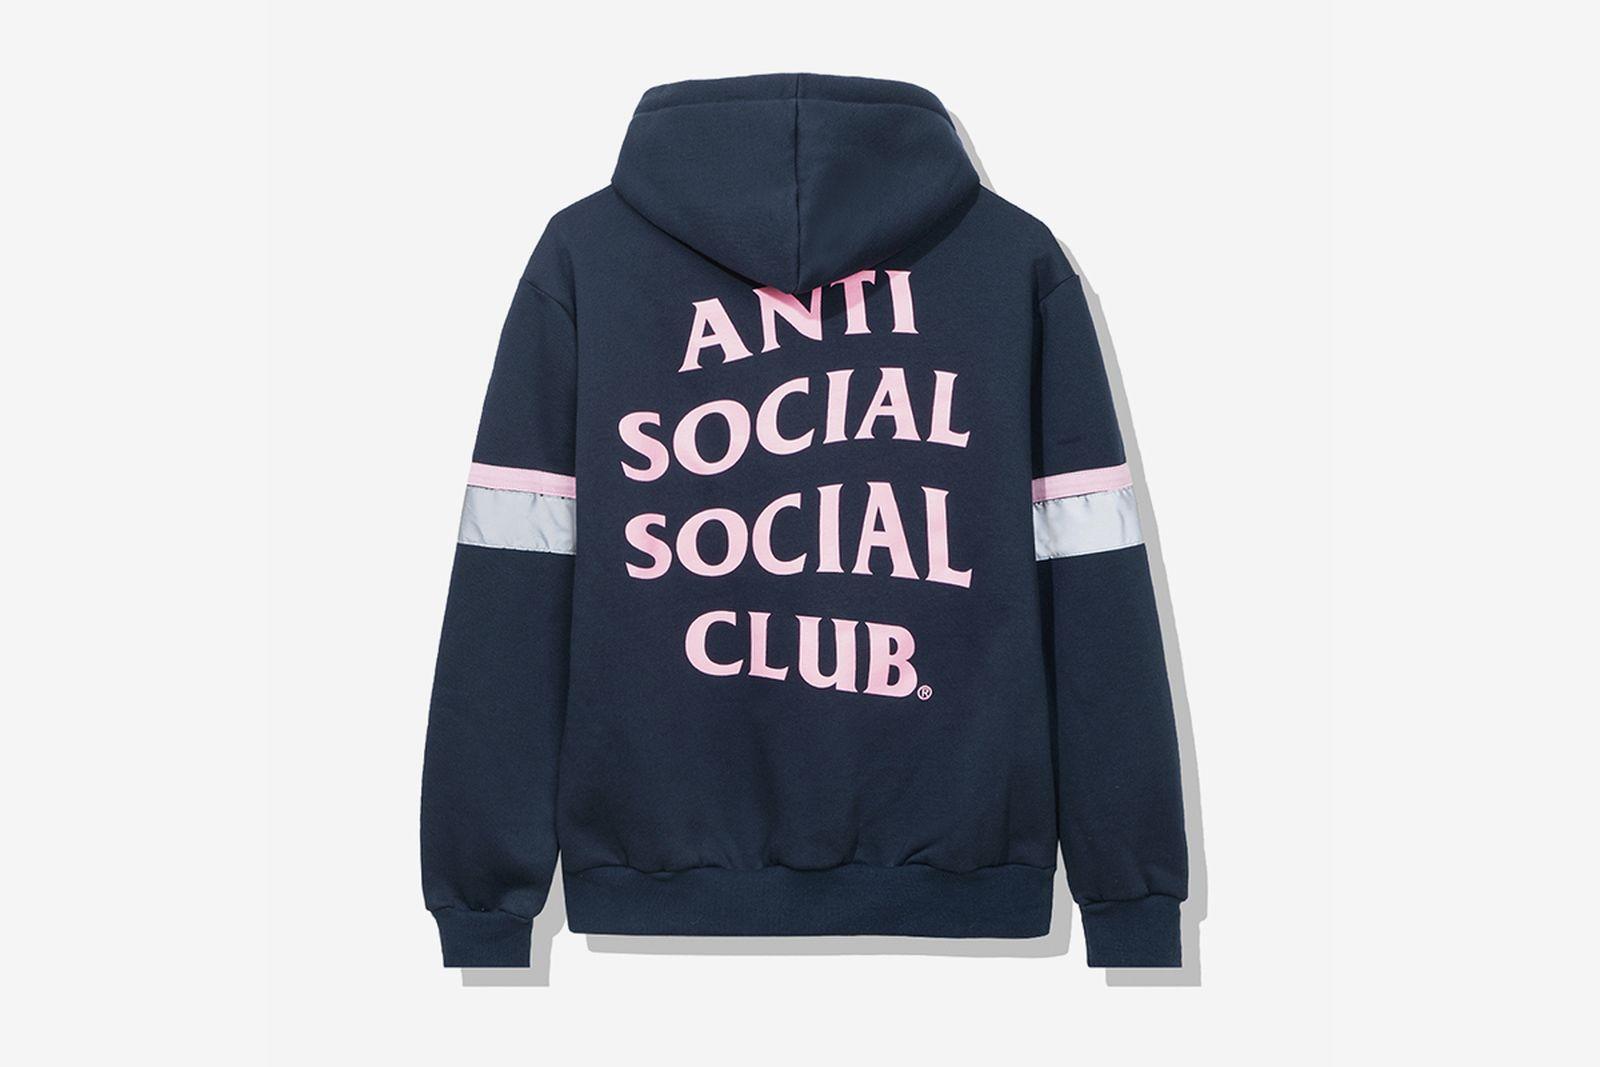 anti-social-social-club-usps-collaboration-2-08